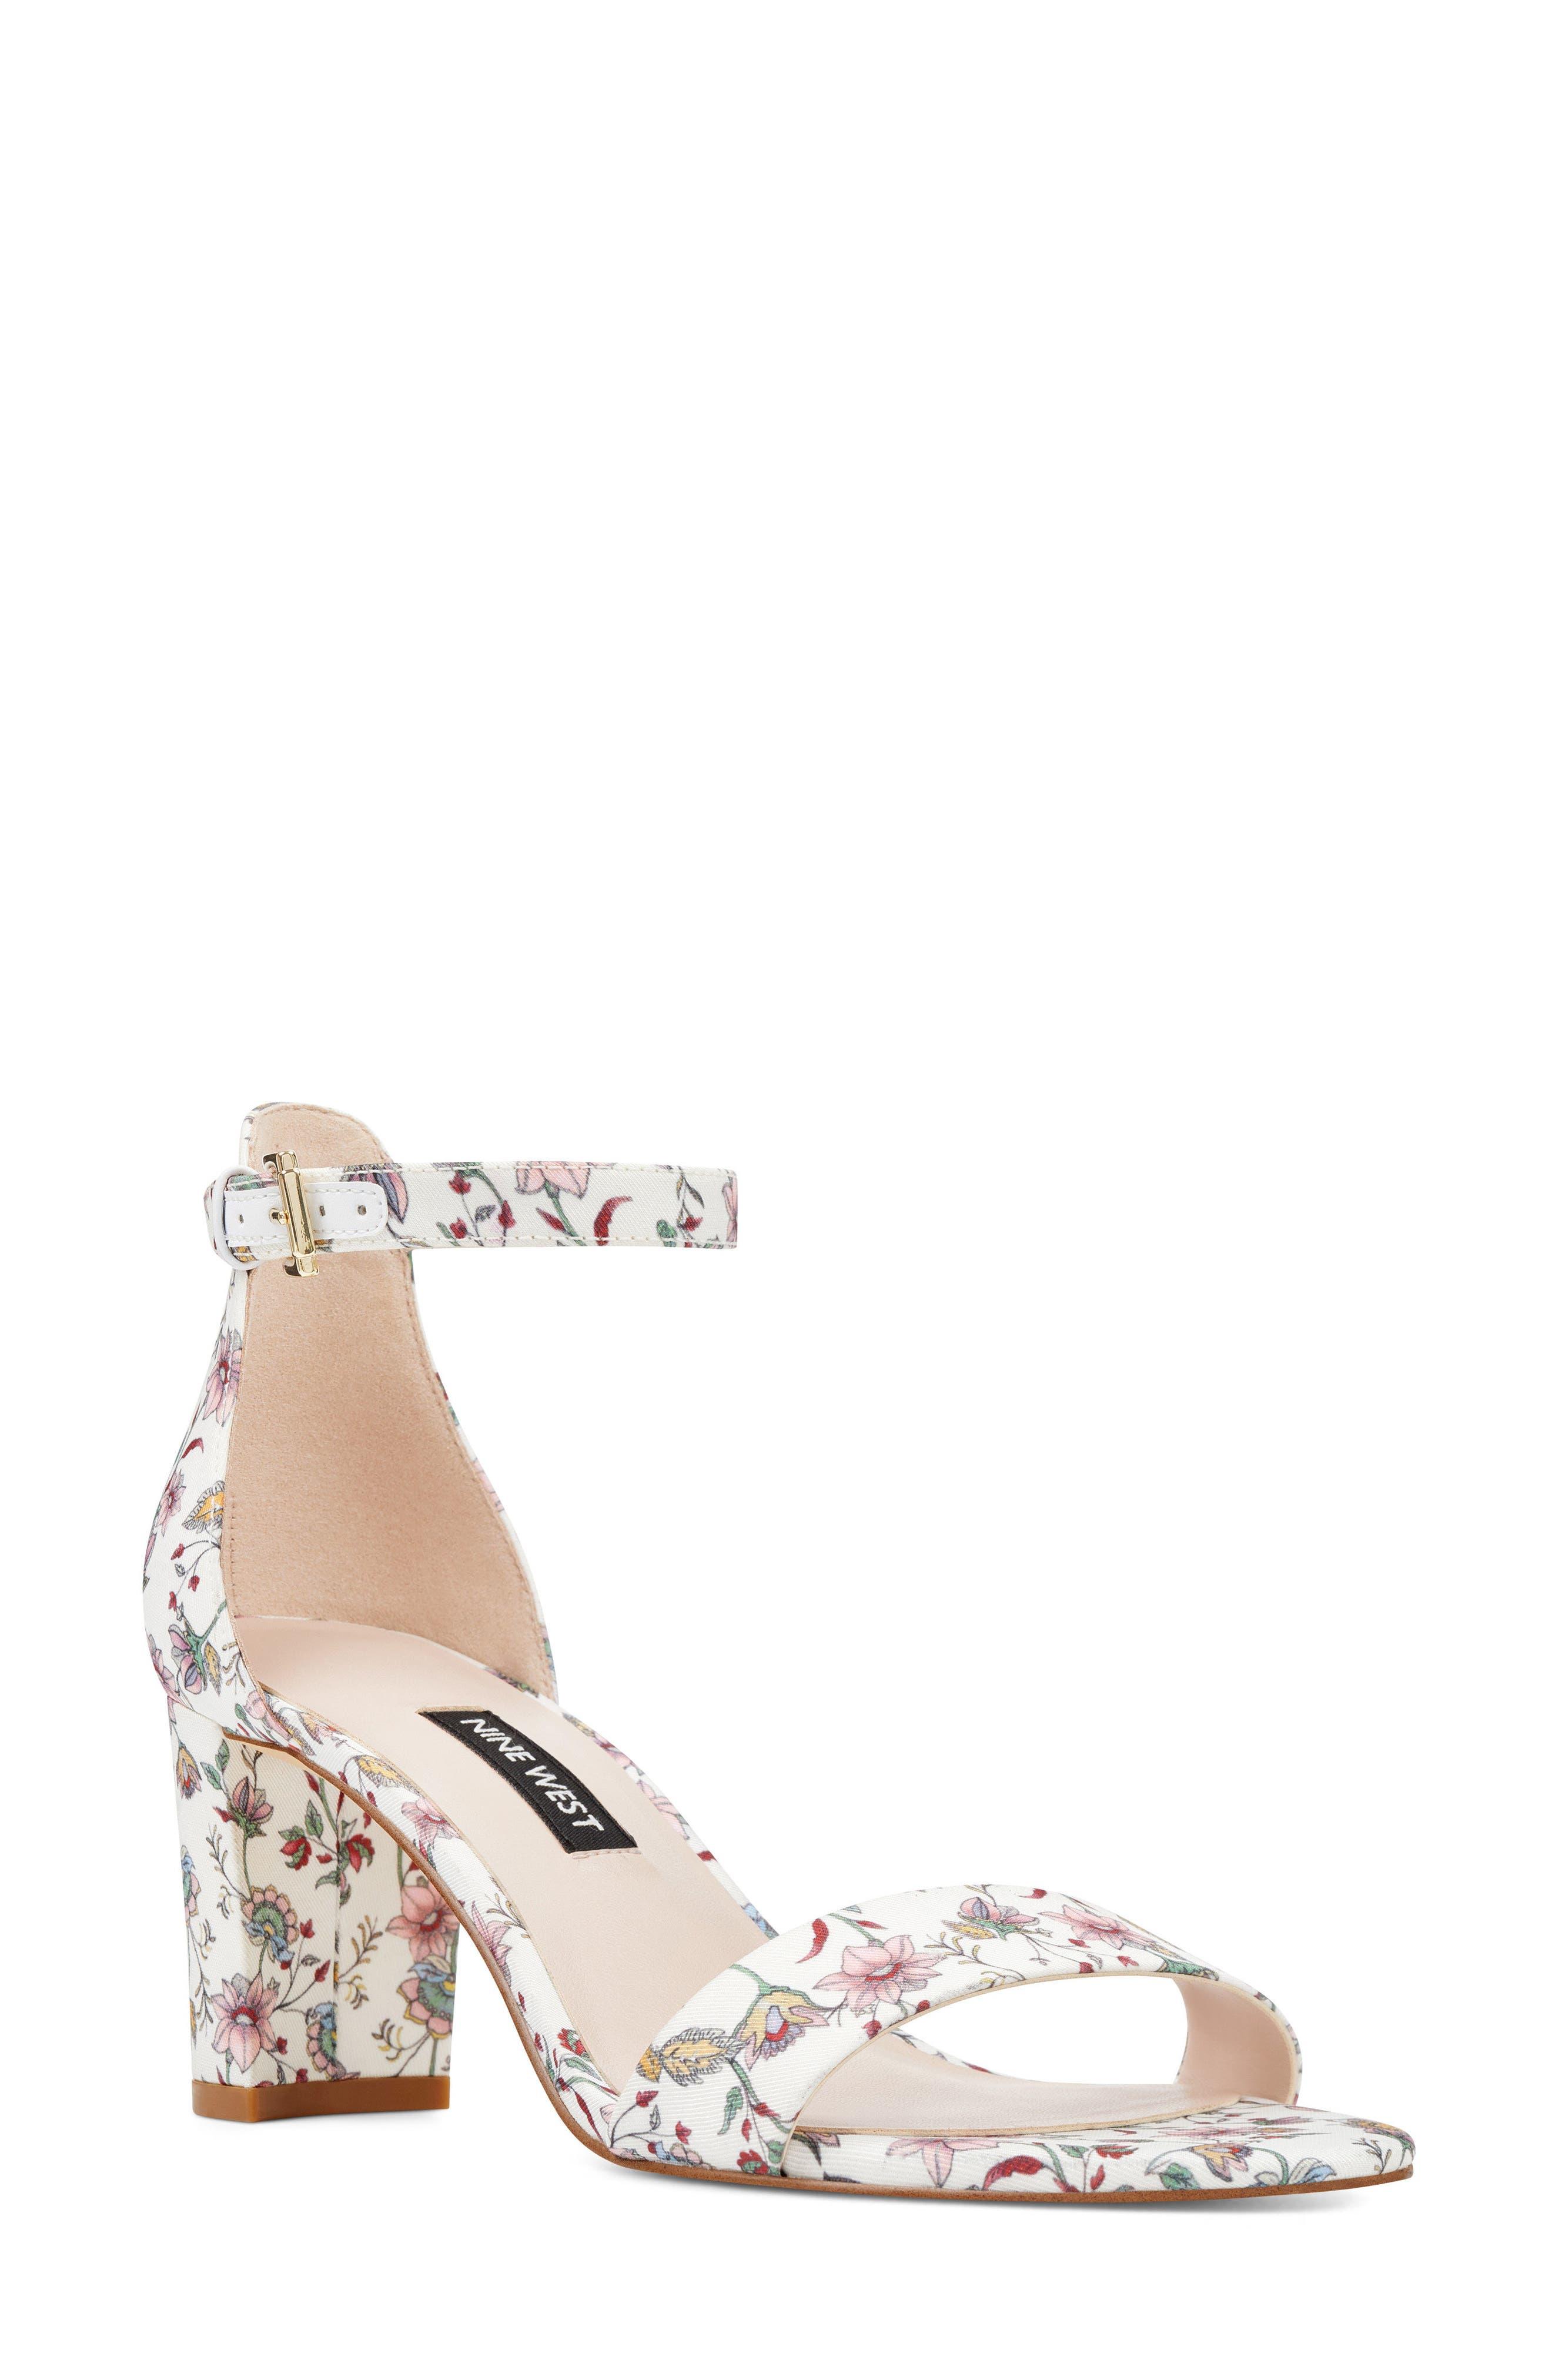 Pruce Ankle Strap Sandal,                             Main thumbnail 1, color,                             White Multi